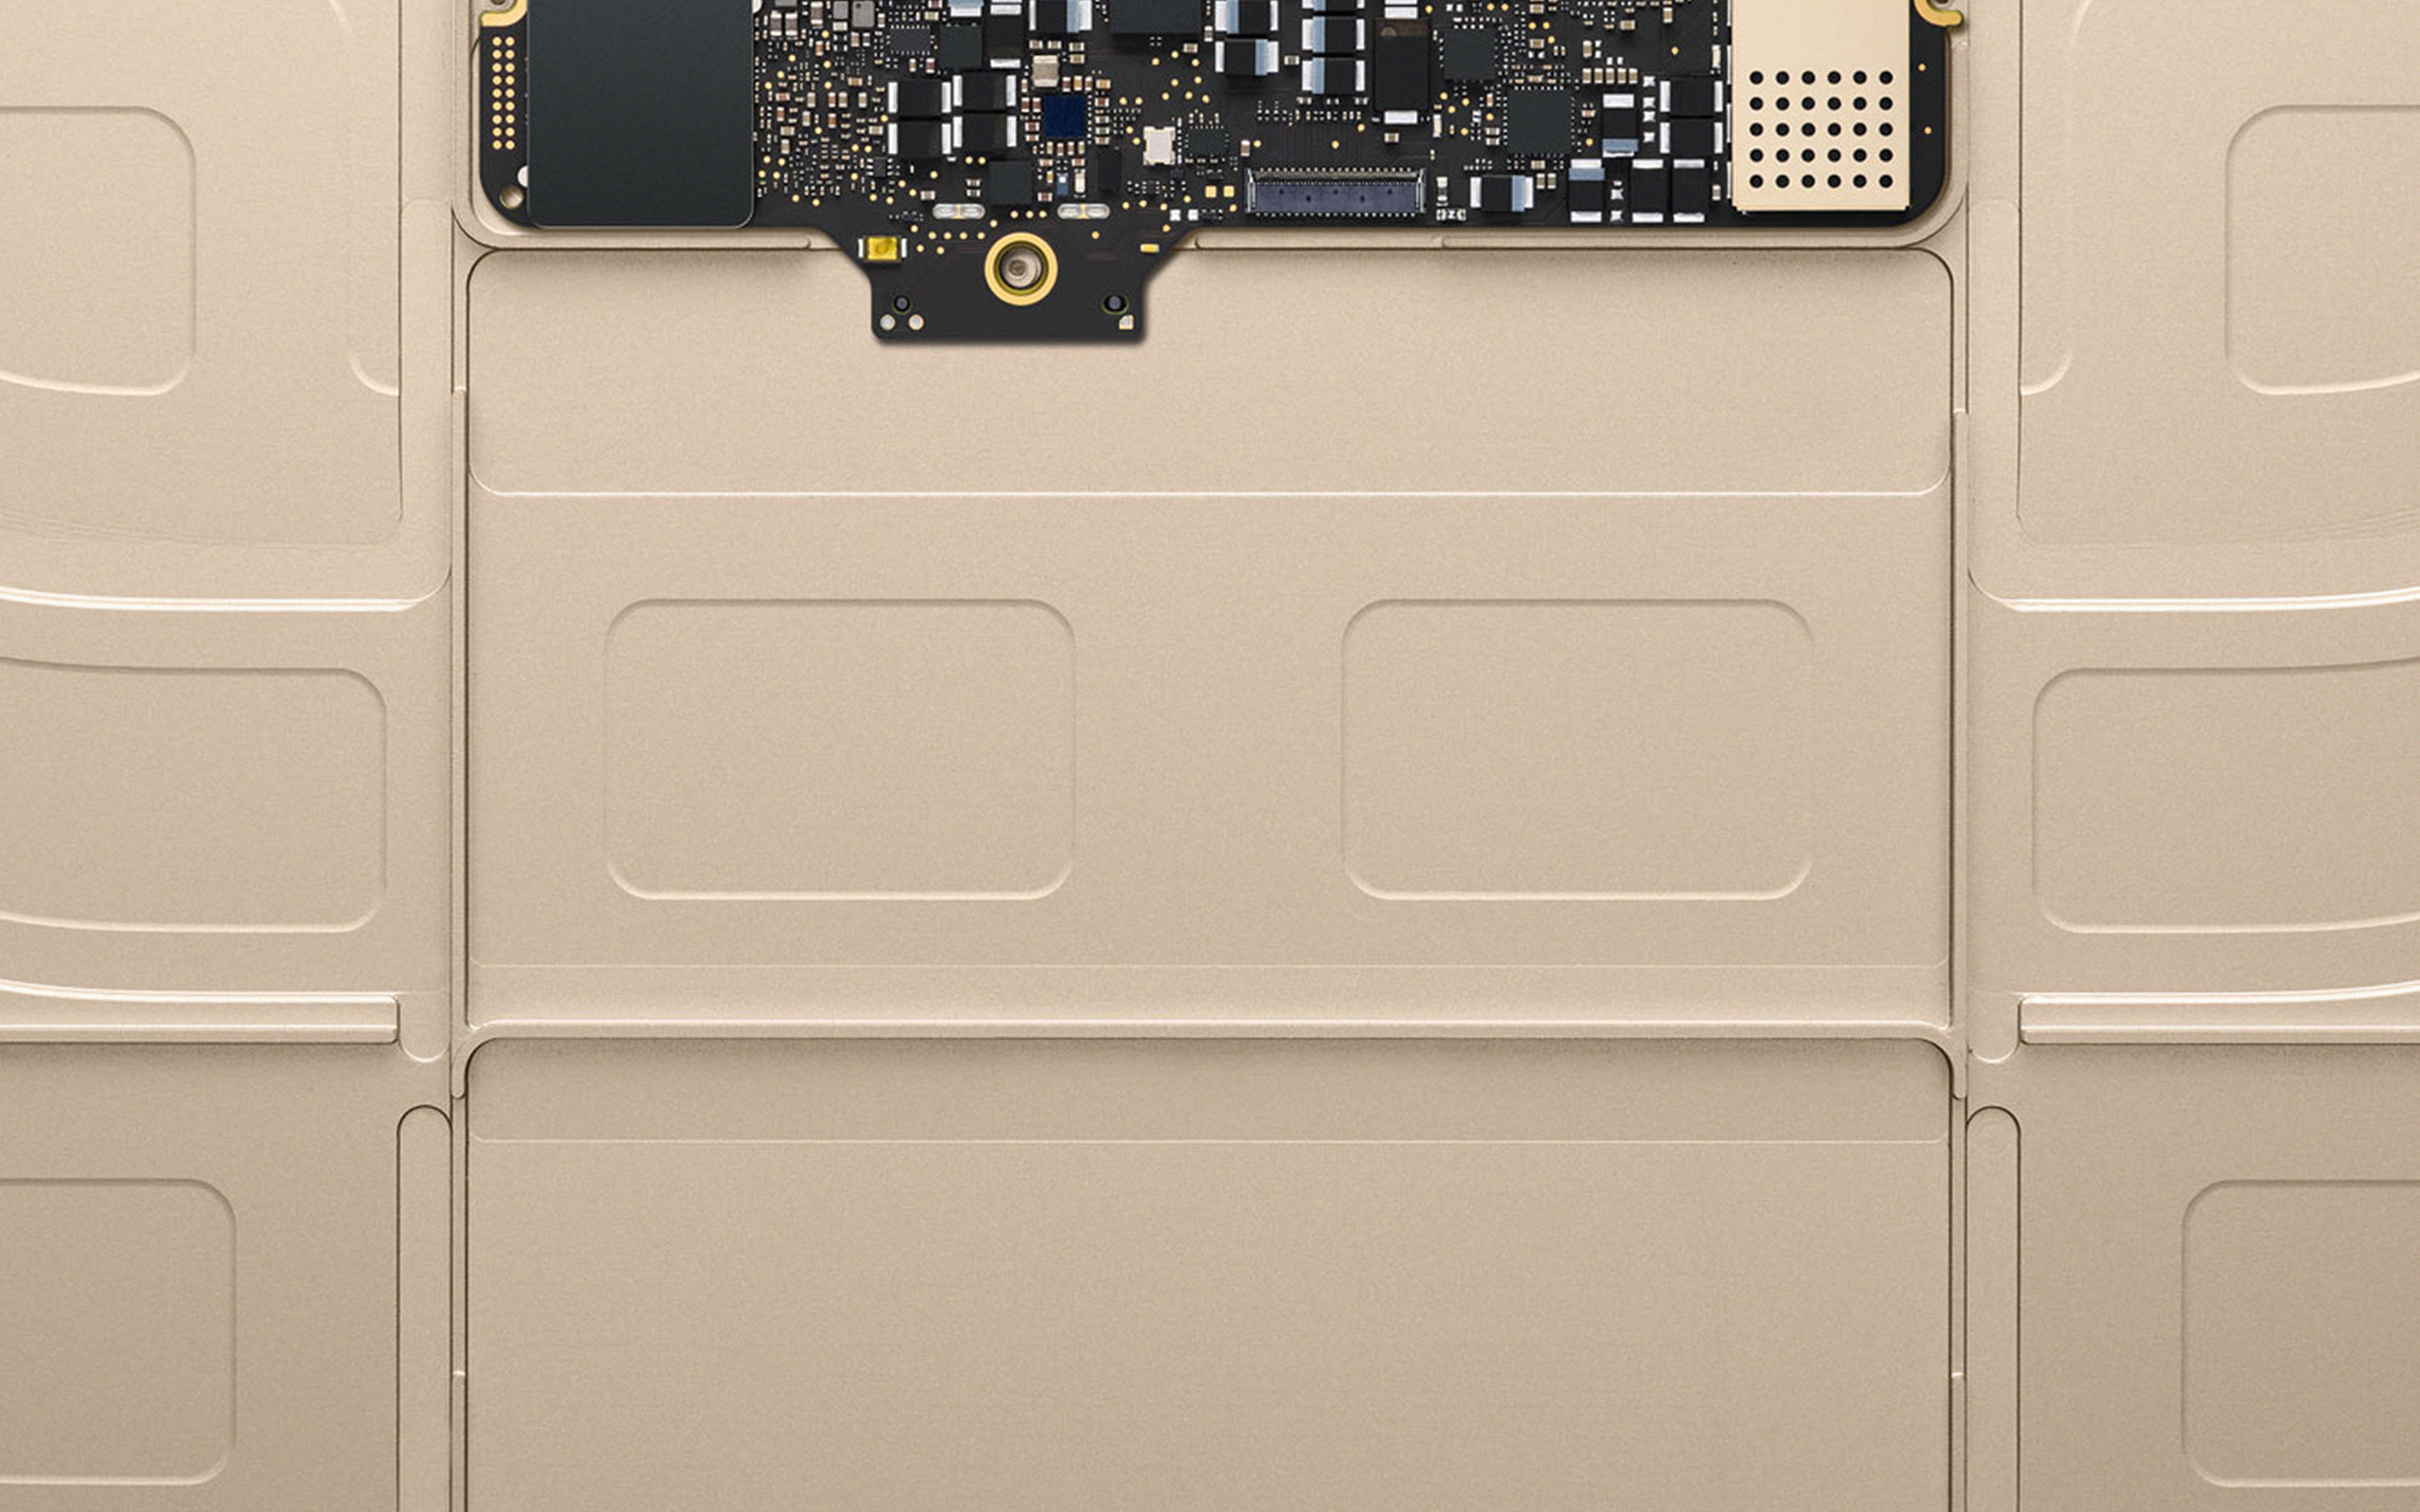 Au52 Inside Macbook Gold Apple Illustration Art Wallpaper